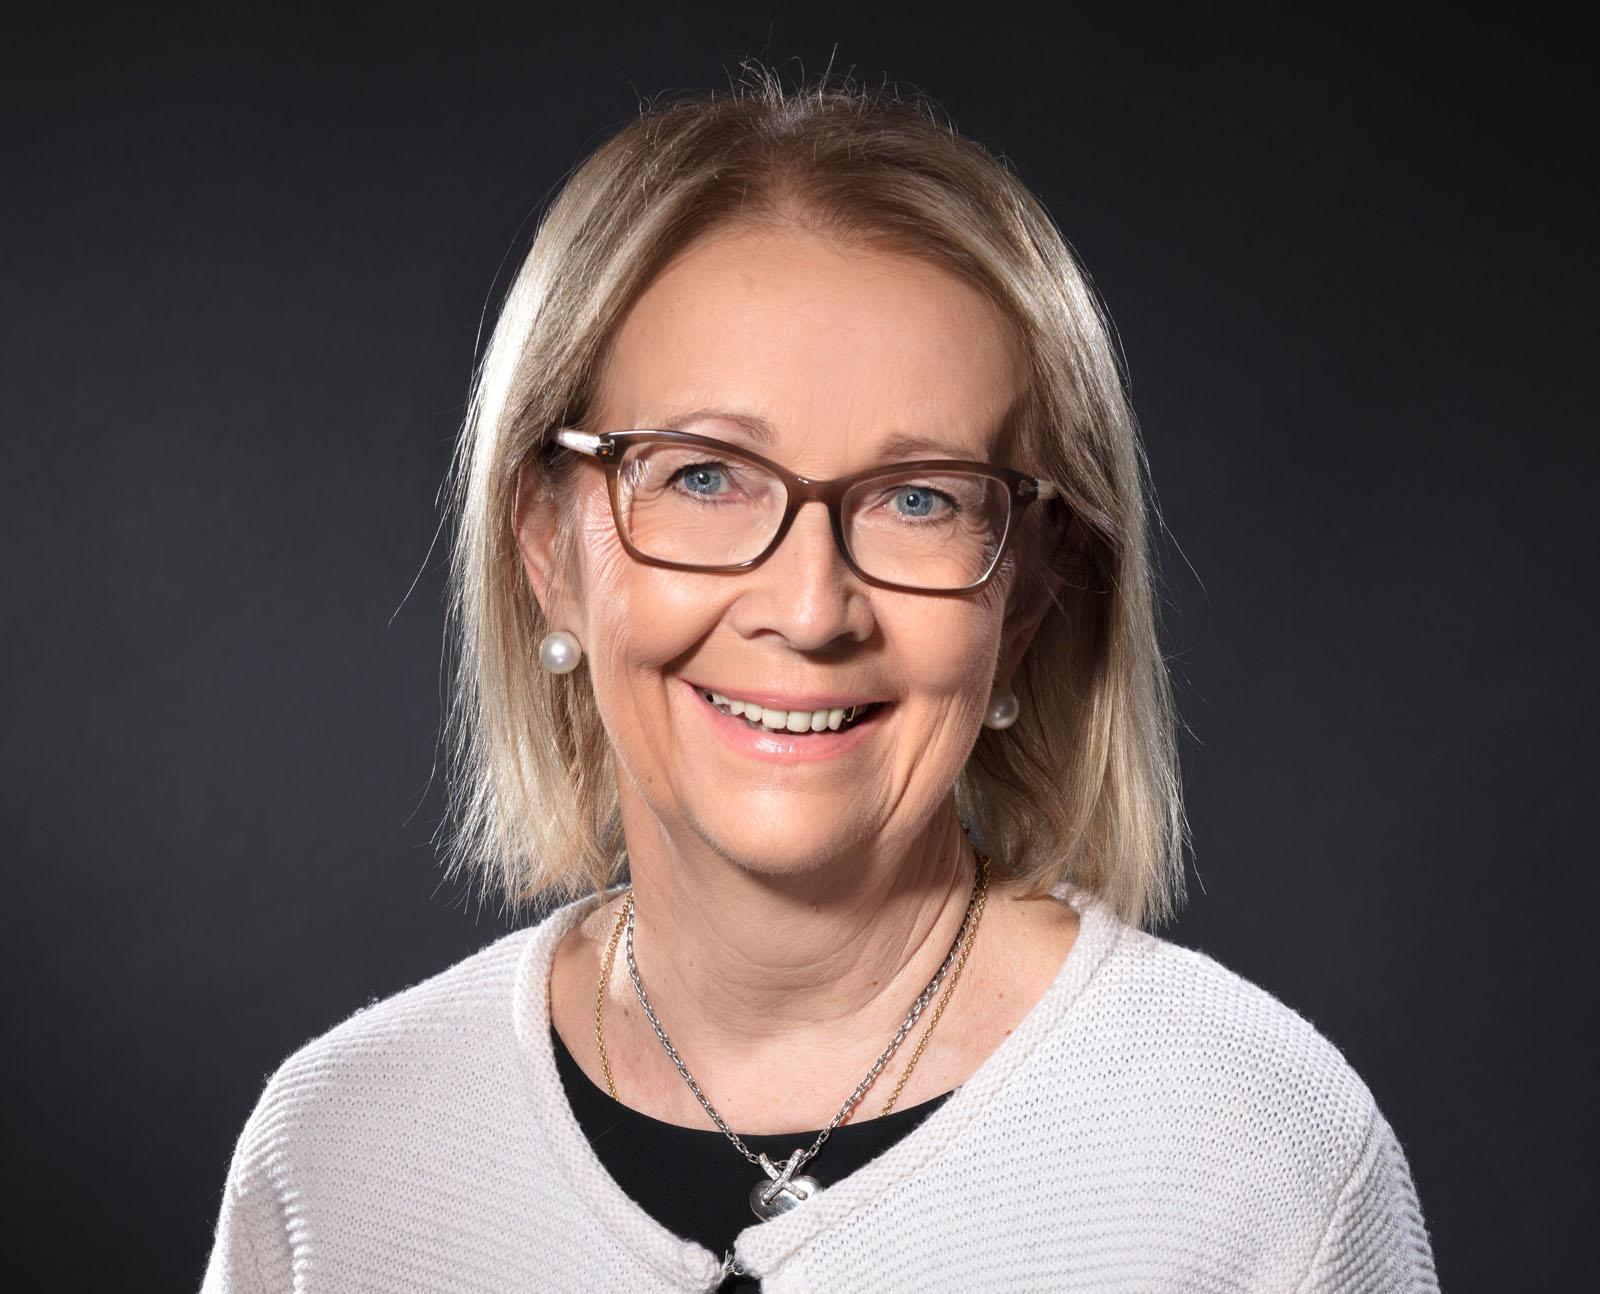 Elisabeth Laithier